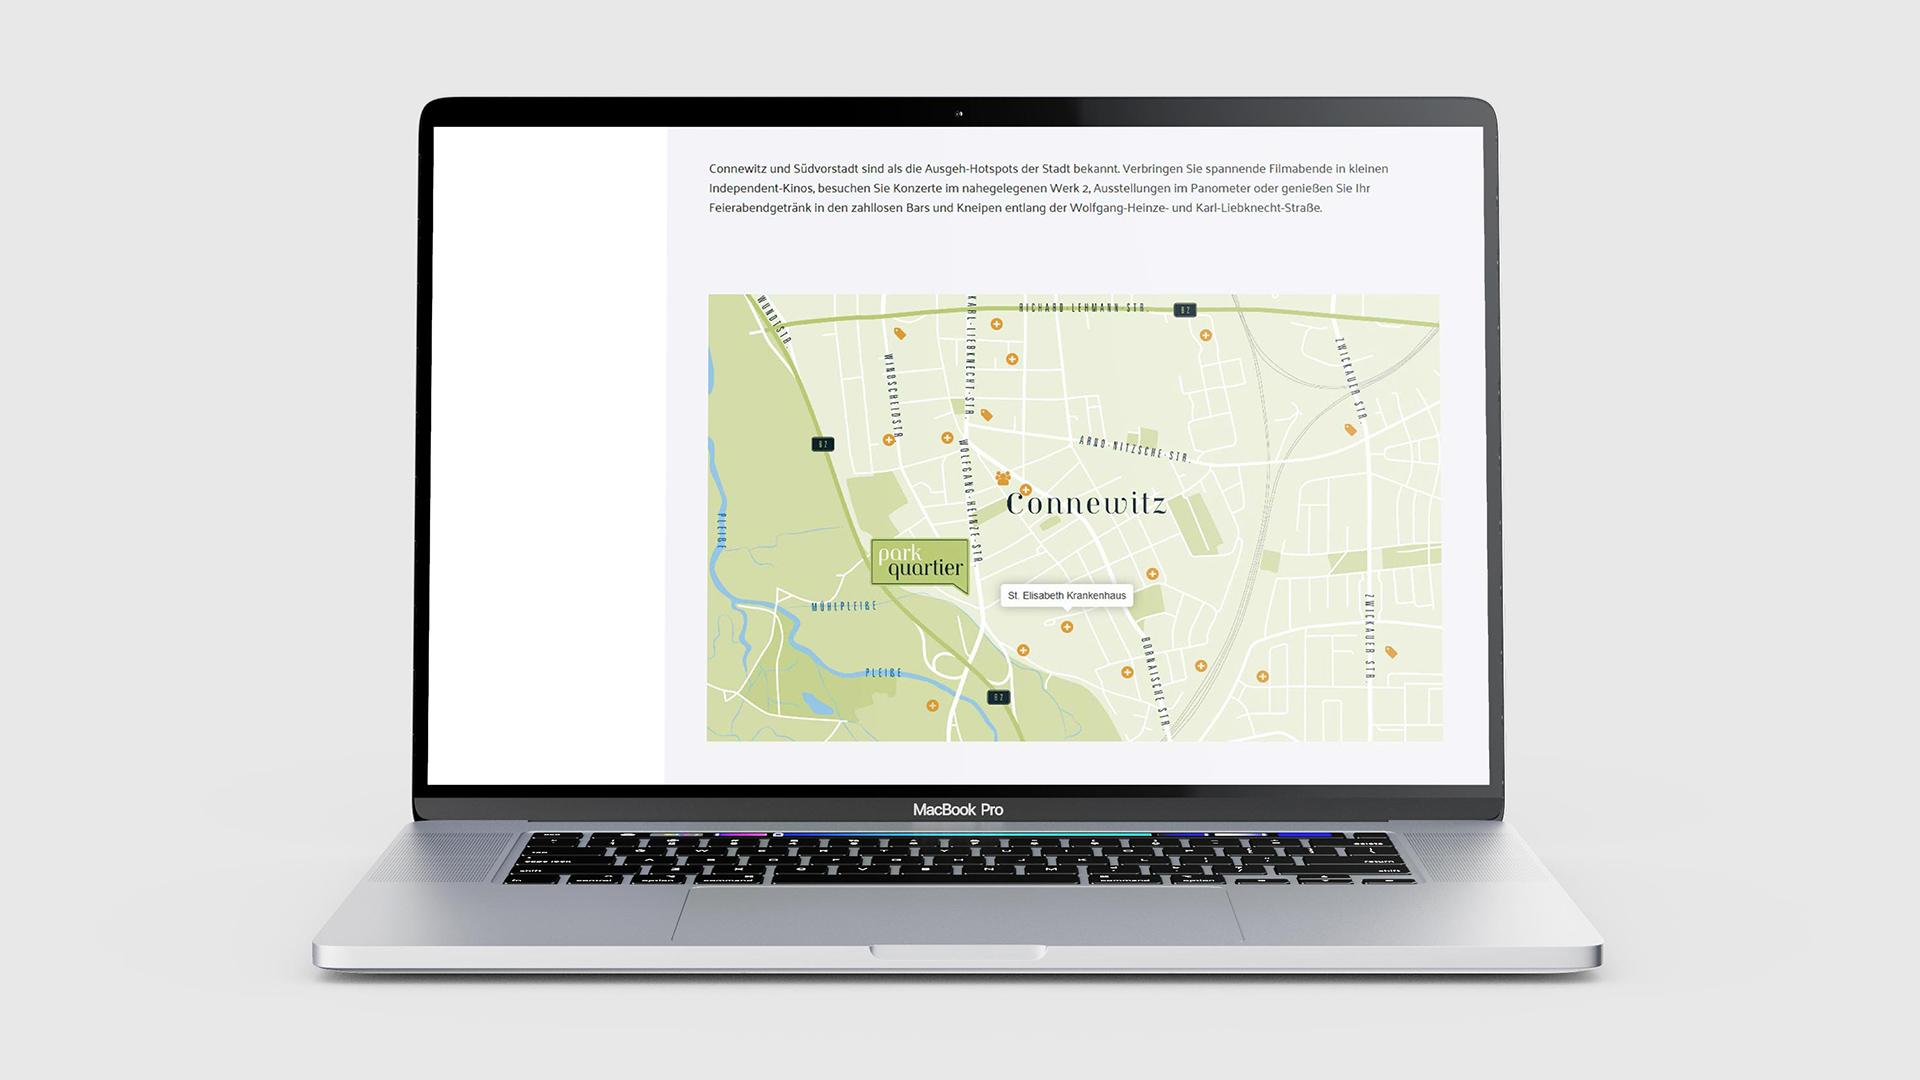 Raum_Visionen_Immobilienmarketing_Parkquartier02